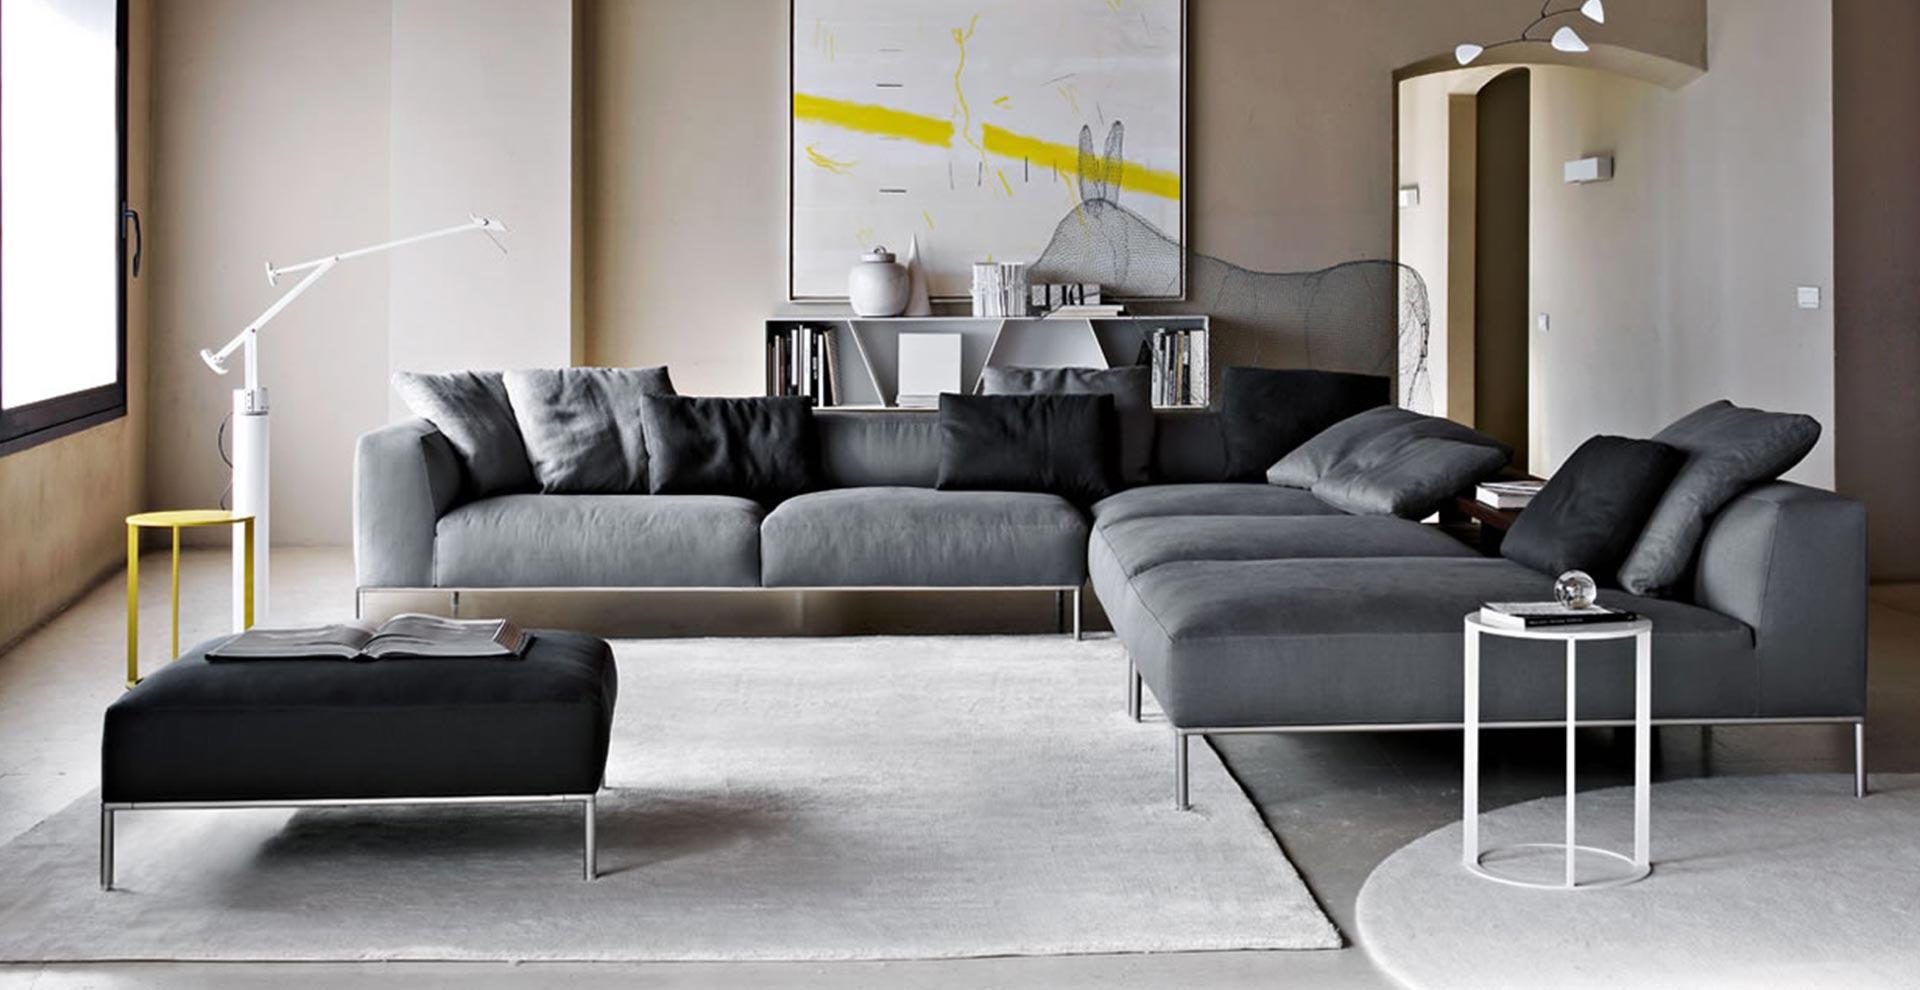 frank b b italia comodino frank b b italia. Black Bedroom Furniture Sets. Home Design Ideas